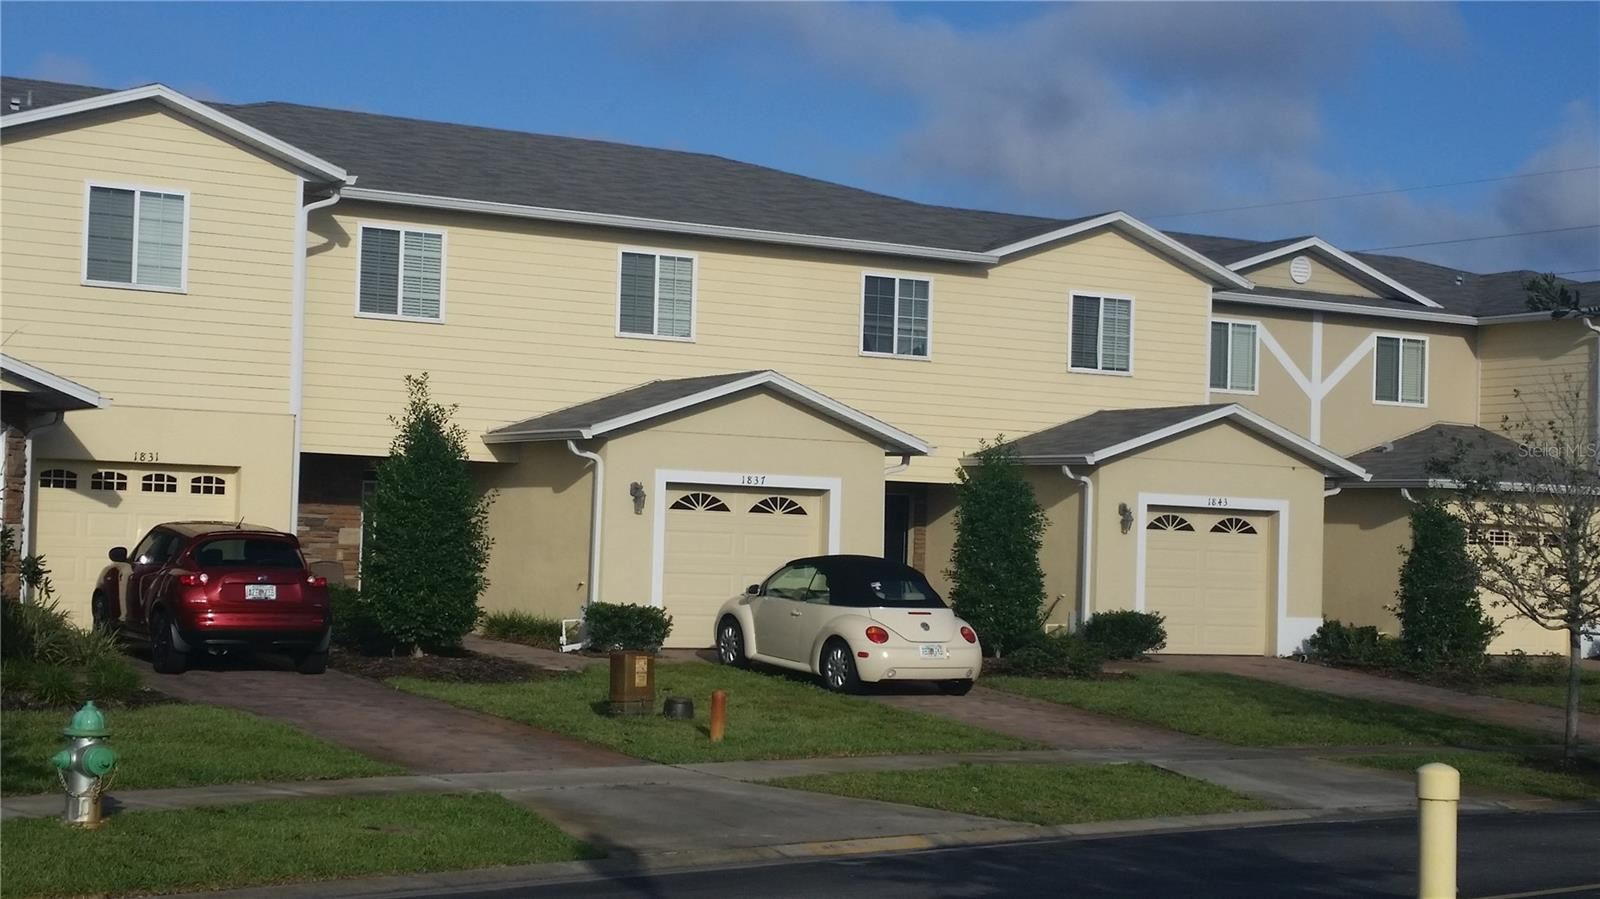 1837 CHATHAM PLACE DRIVE, Orlando, FL 32824 - #: S5056637